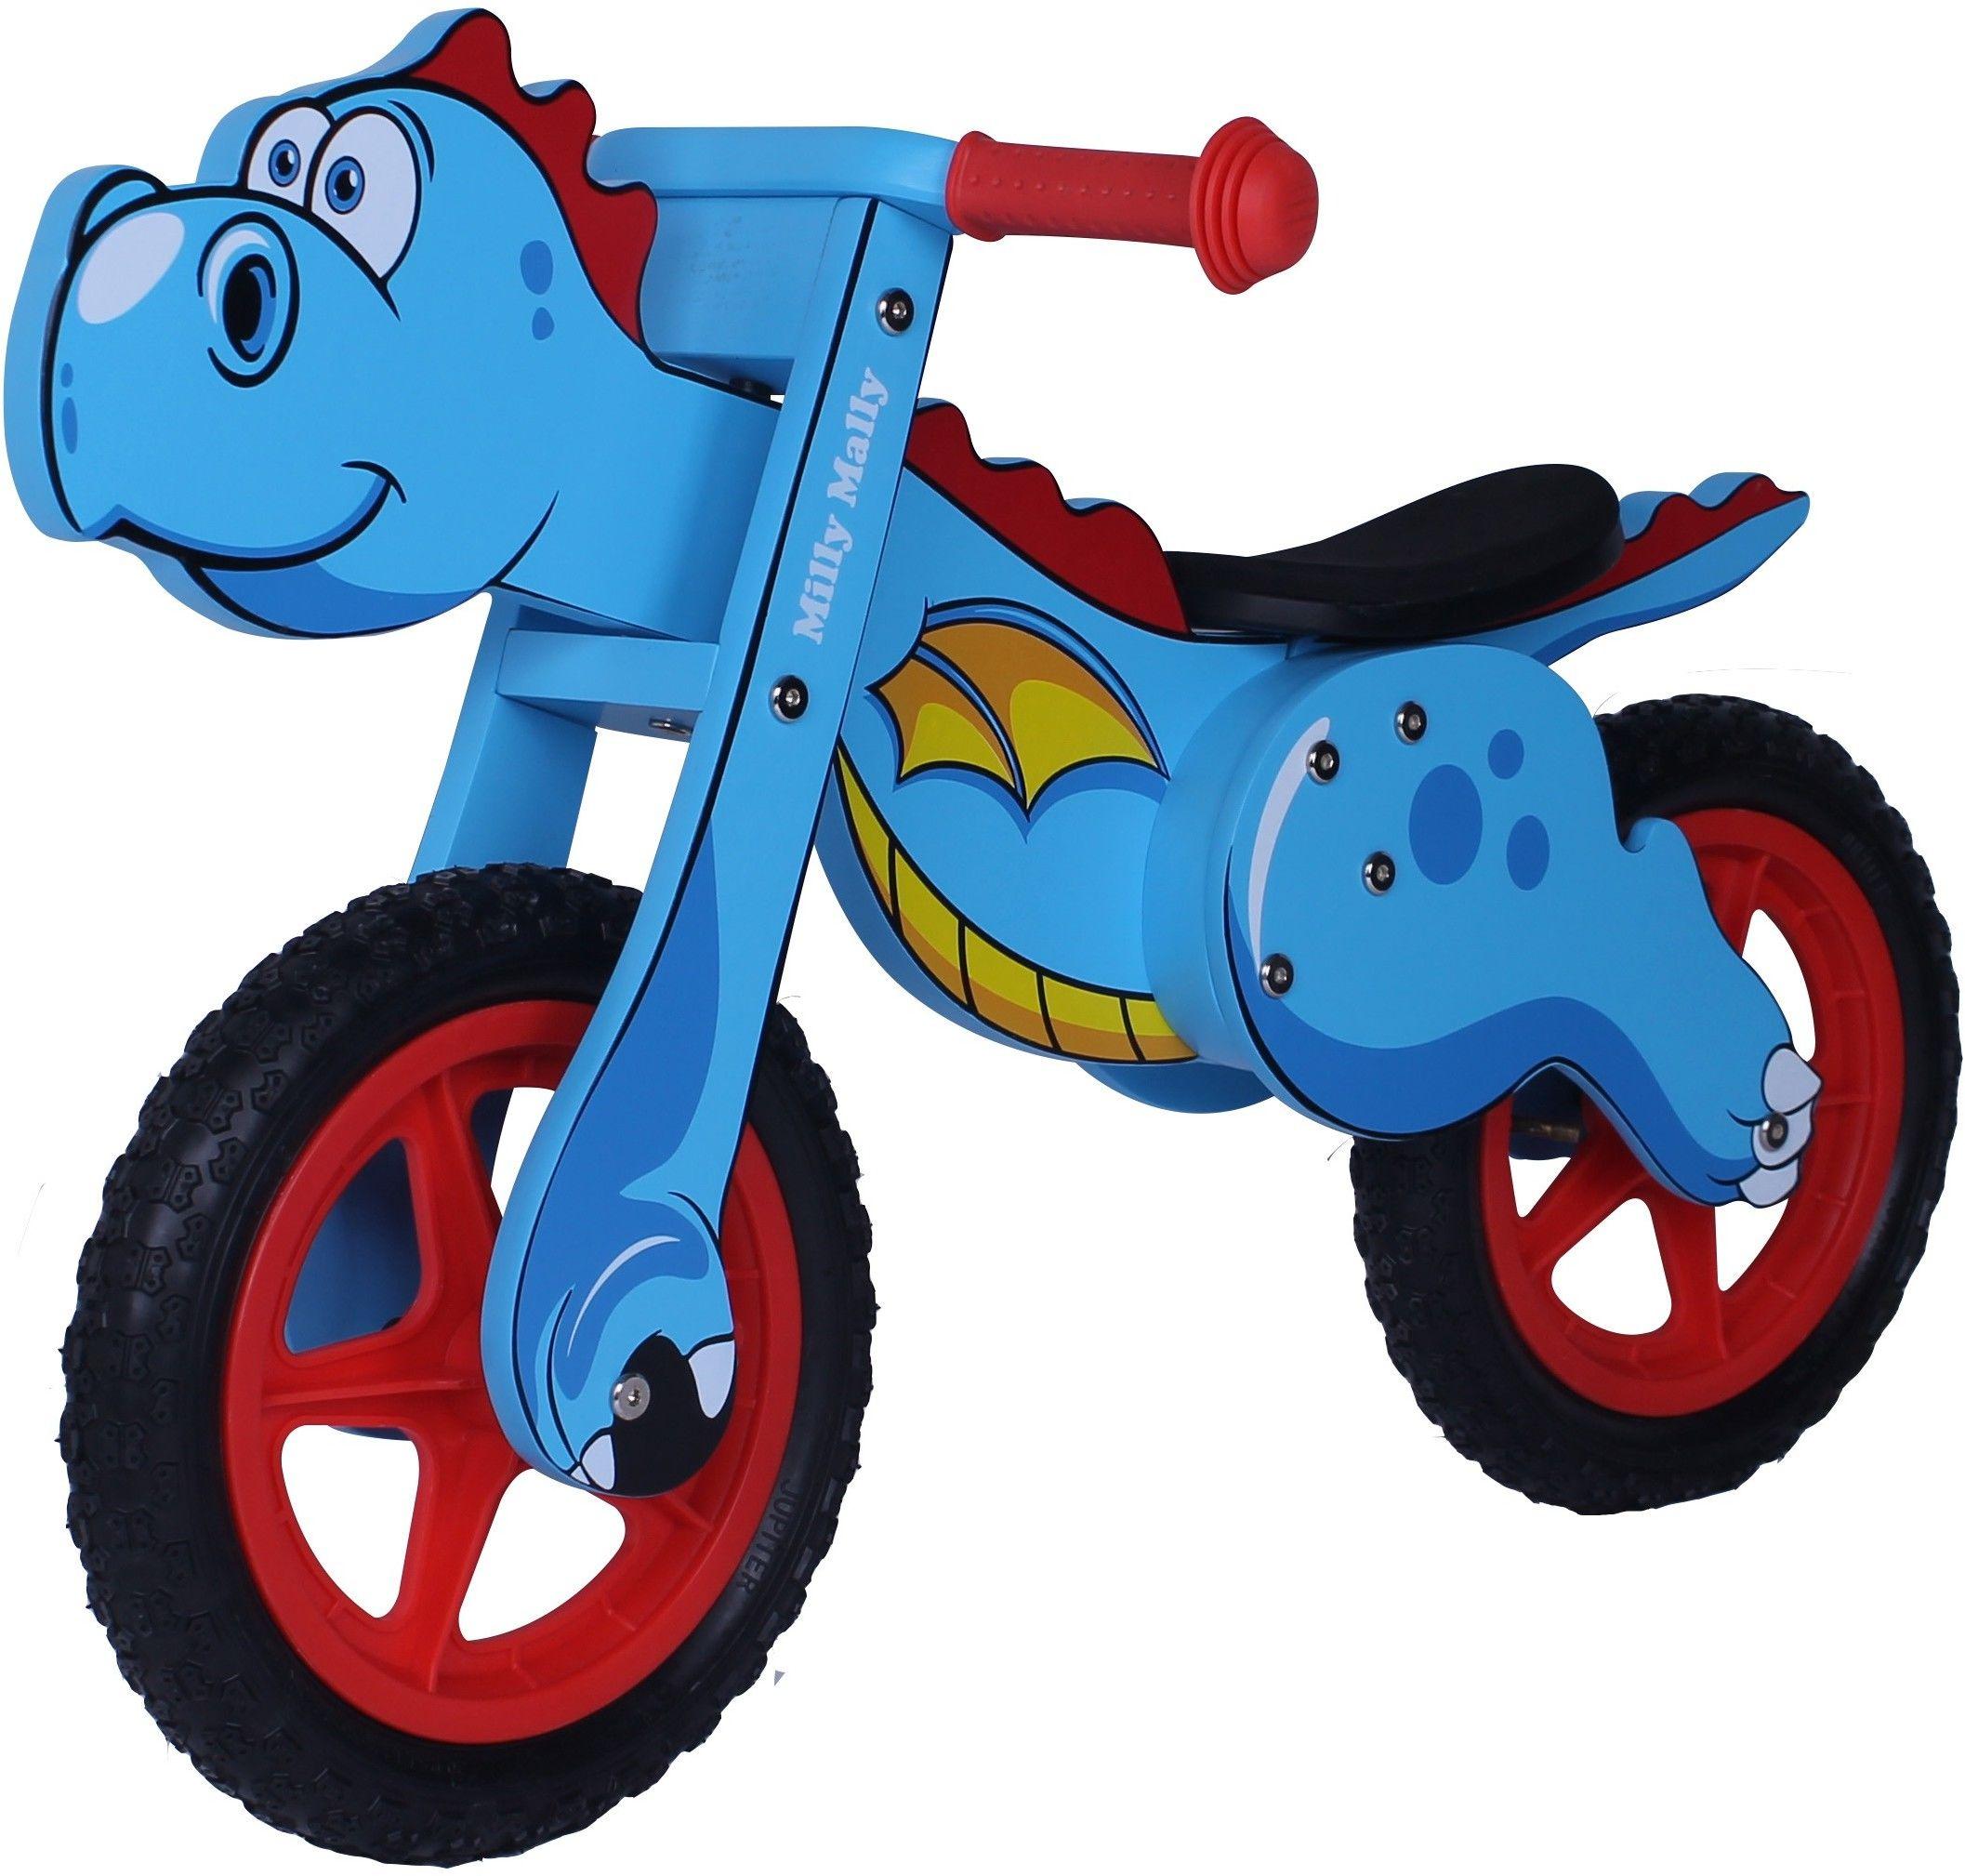 Rowerek Biegowy Dino Mini Blue